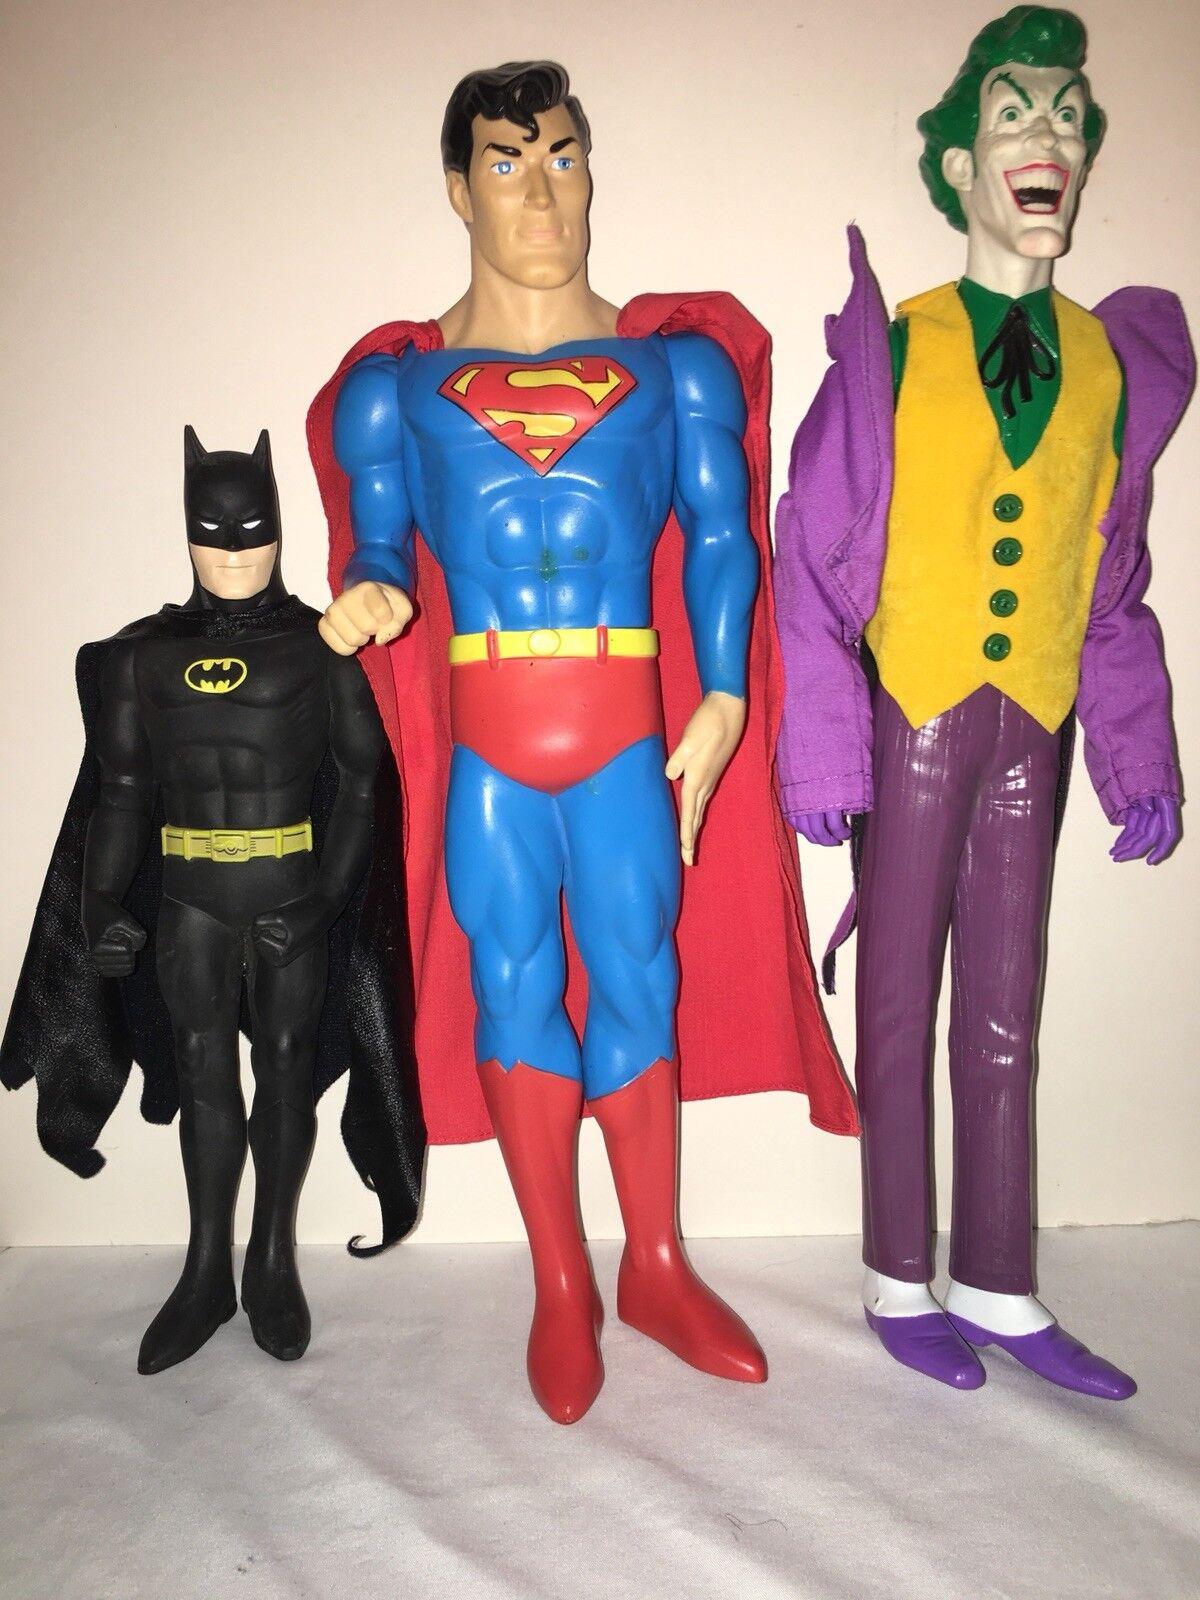 "198889 Vinyl cifra Lot of 3 DC Comics Hamilton Gifts Batuomo Superuomo Joker 15"""